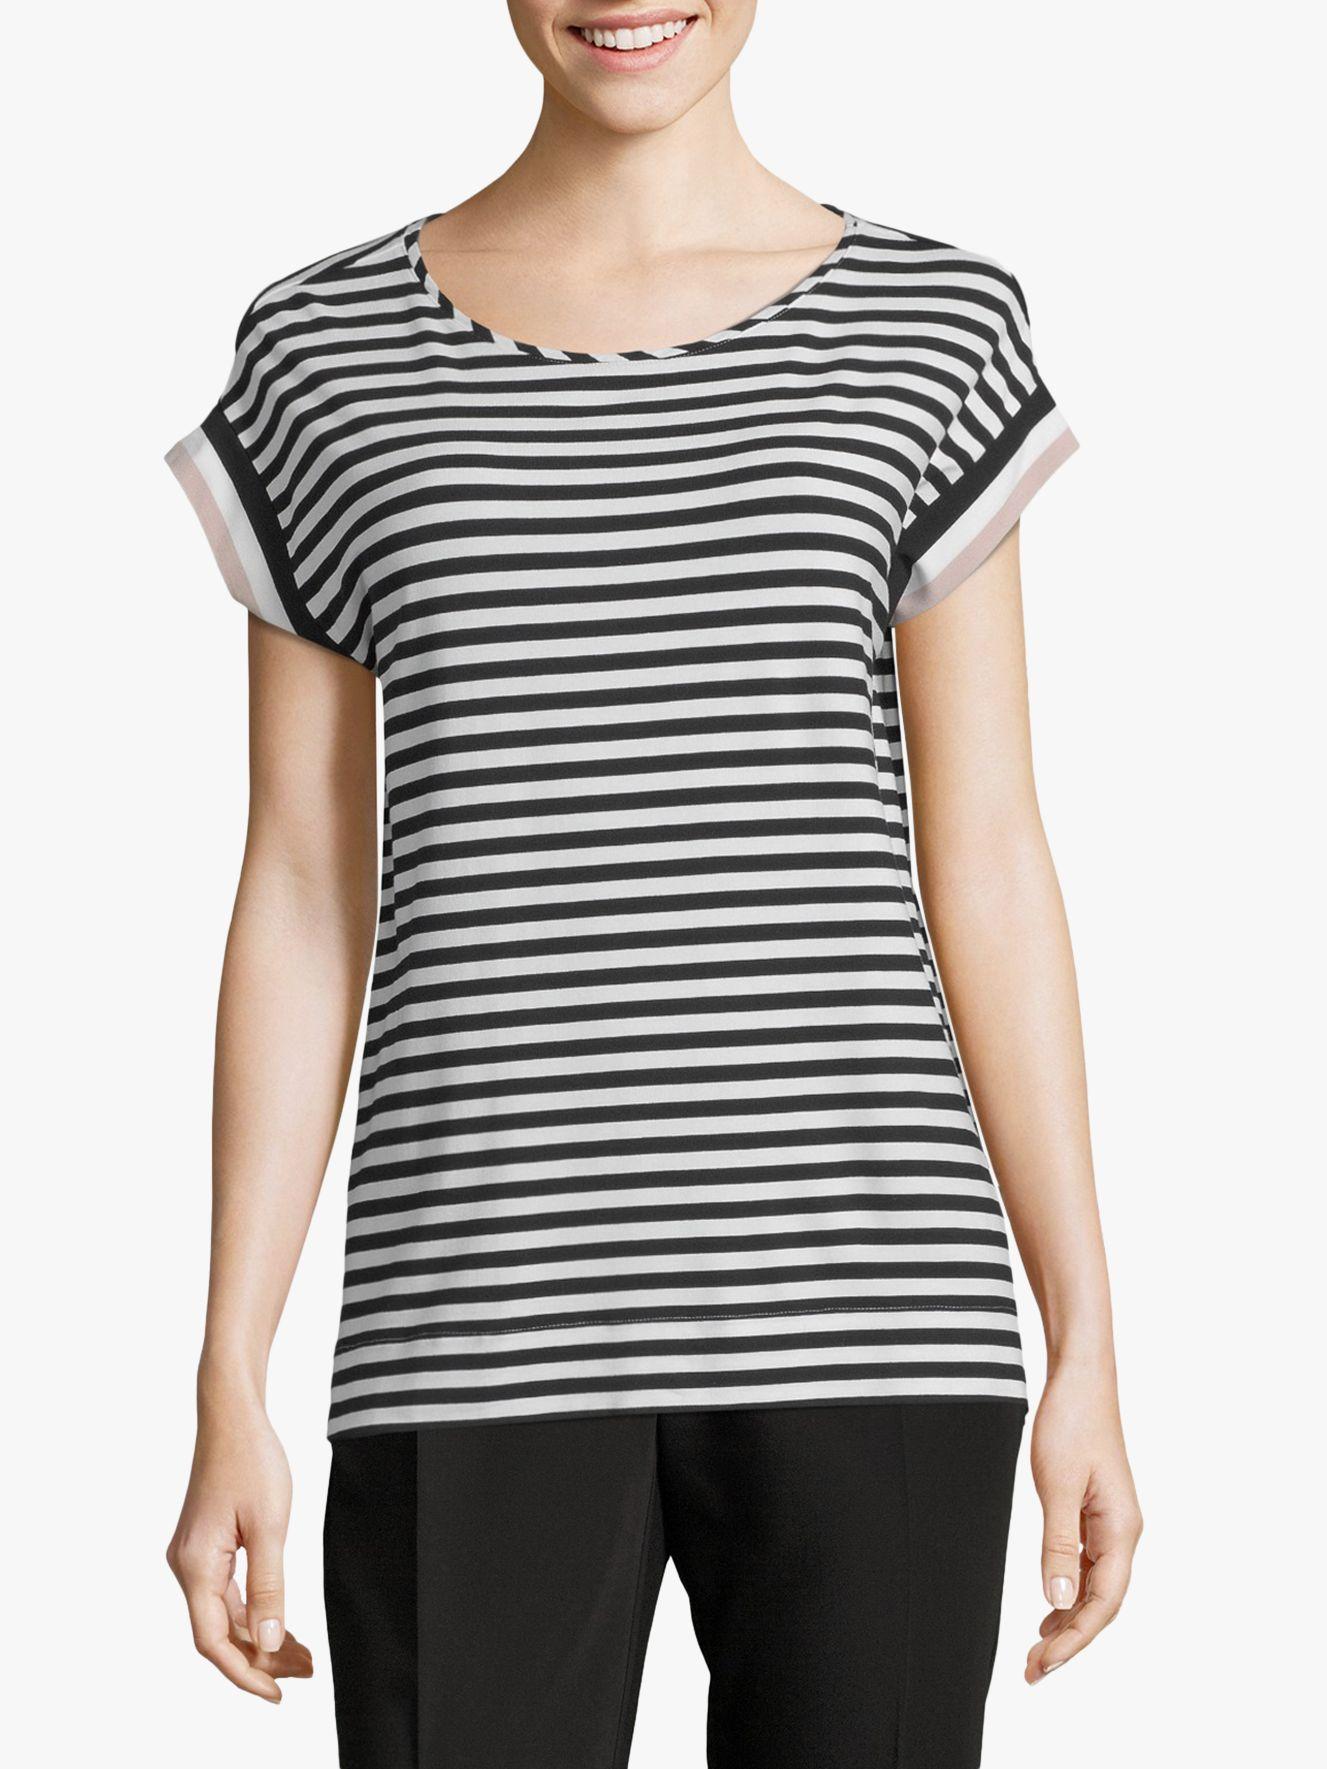 Betty Barclay Betty & Co Striped Short Sleeve T-Shirt, Black/Cream